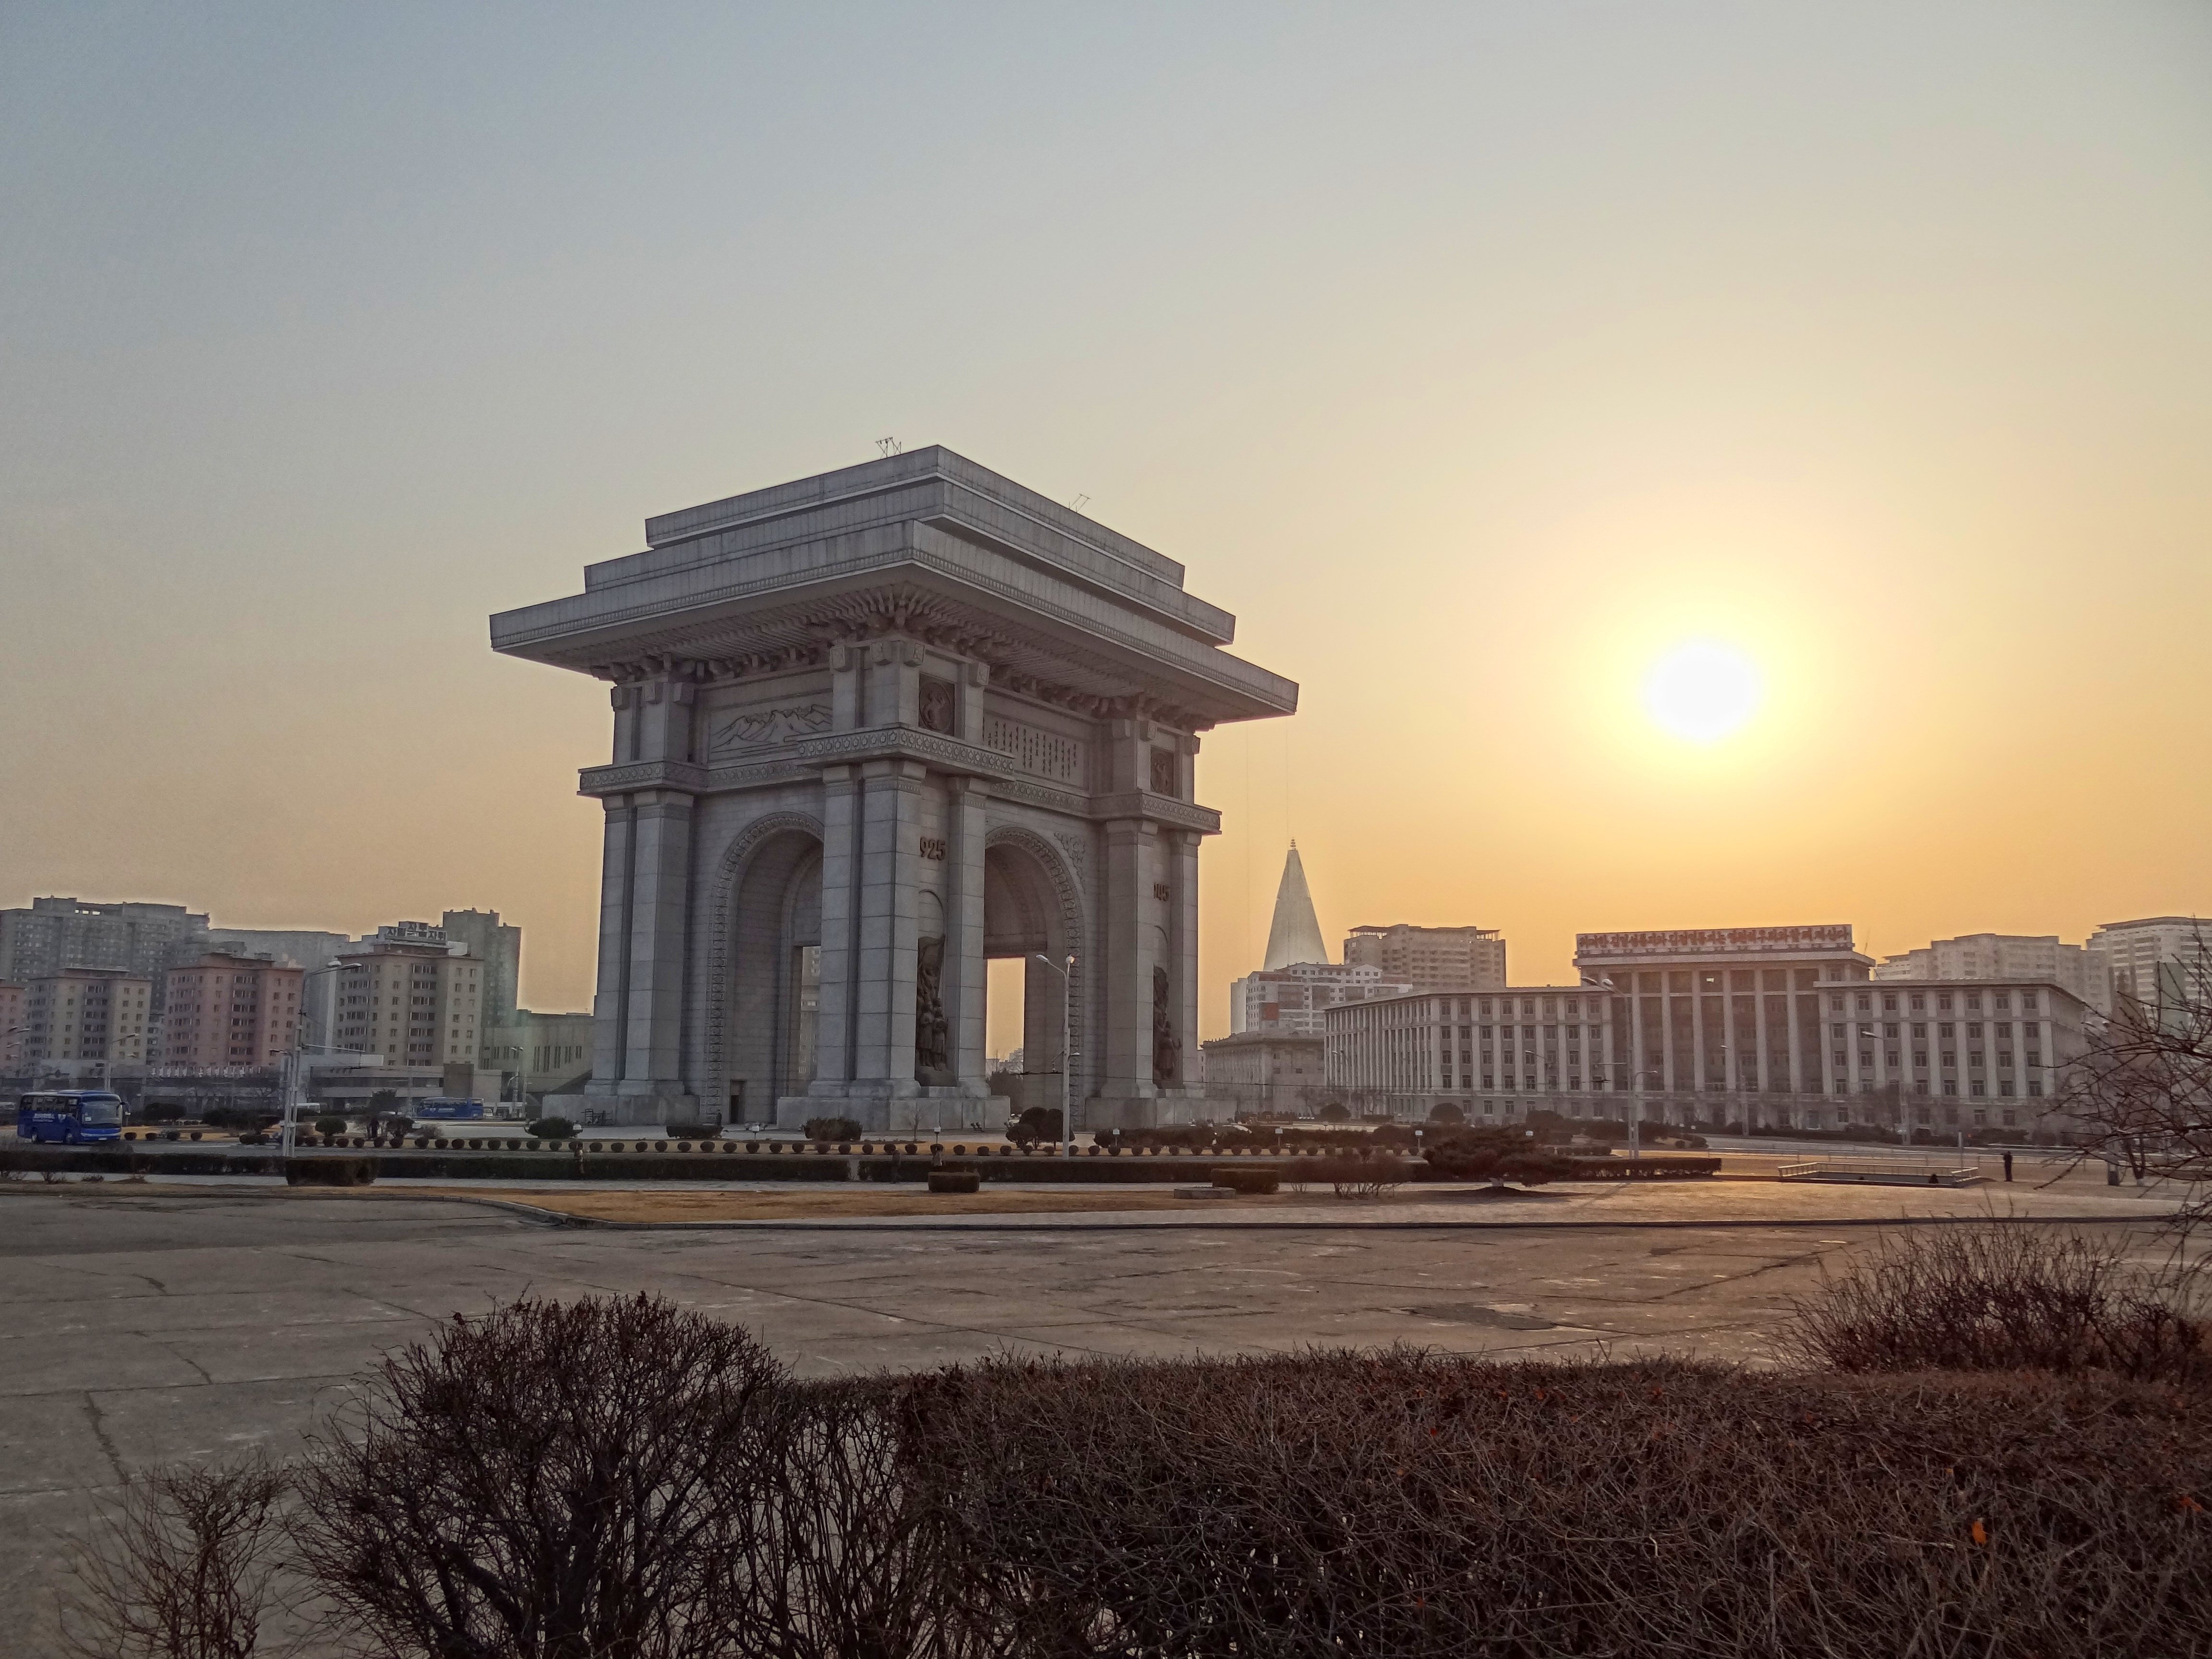 Arch of Triumph (Pyongyang) - Wikipedia